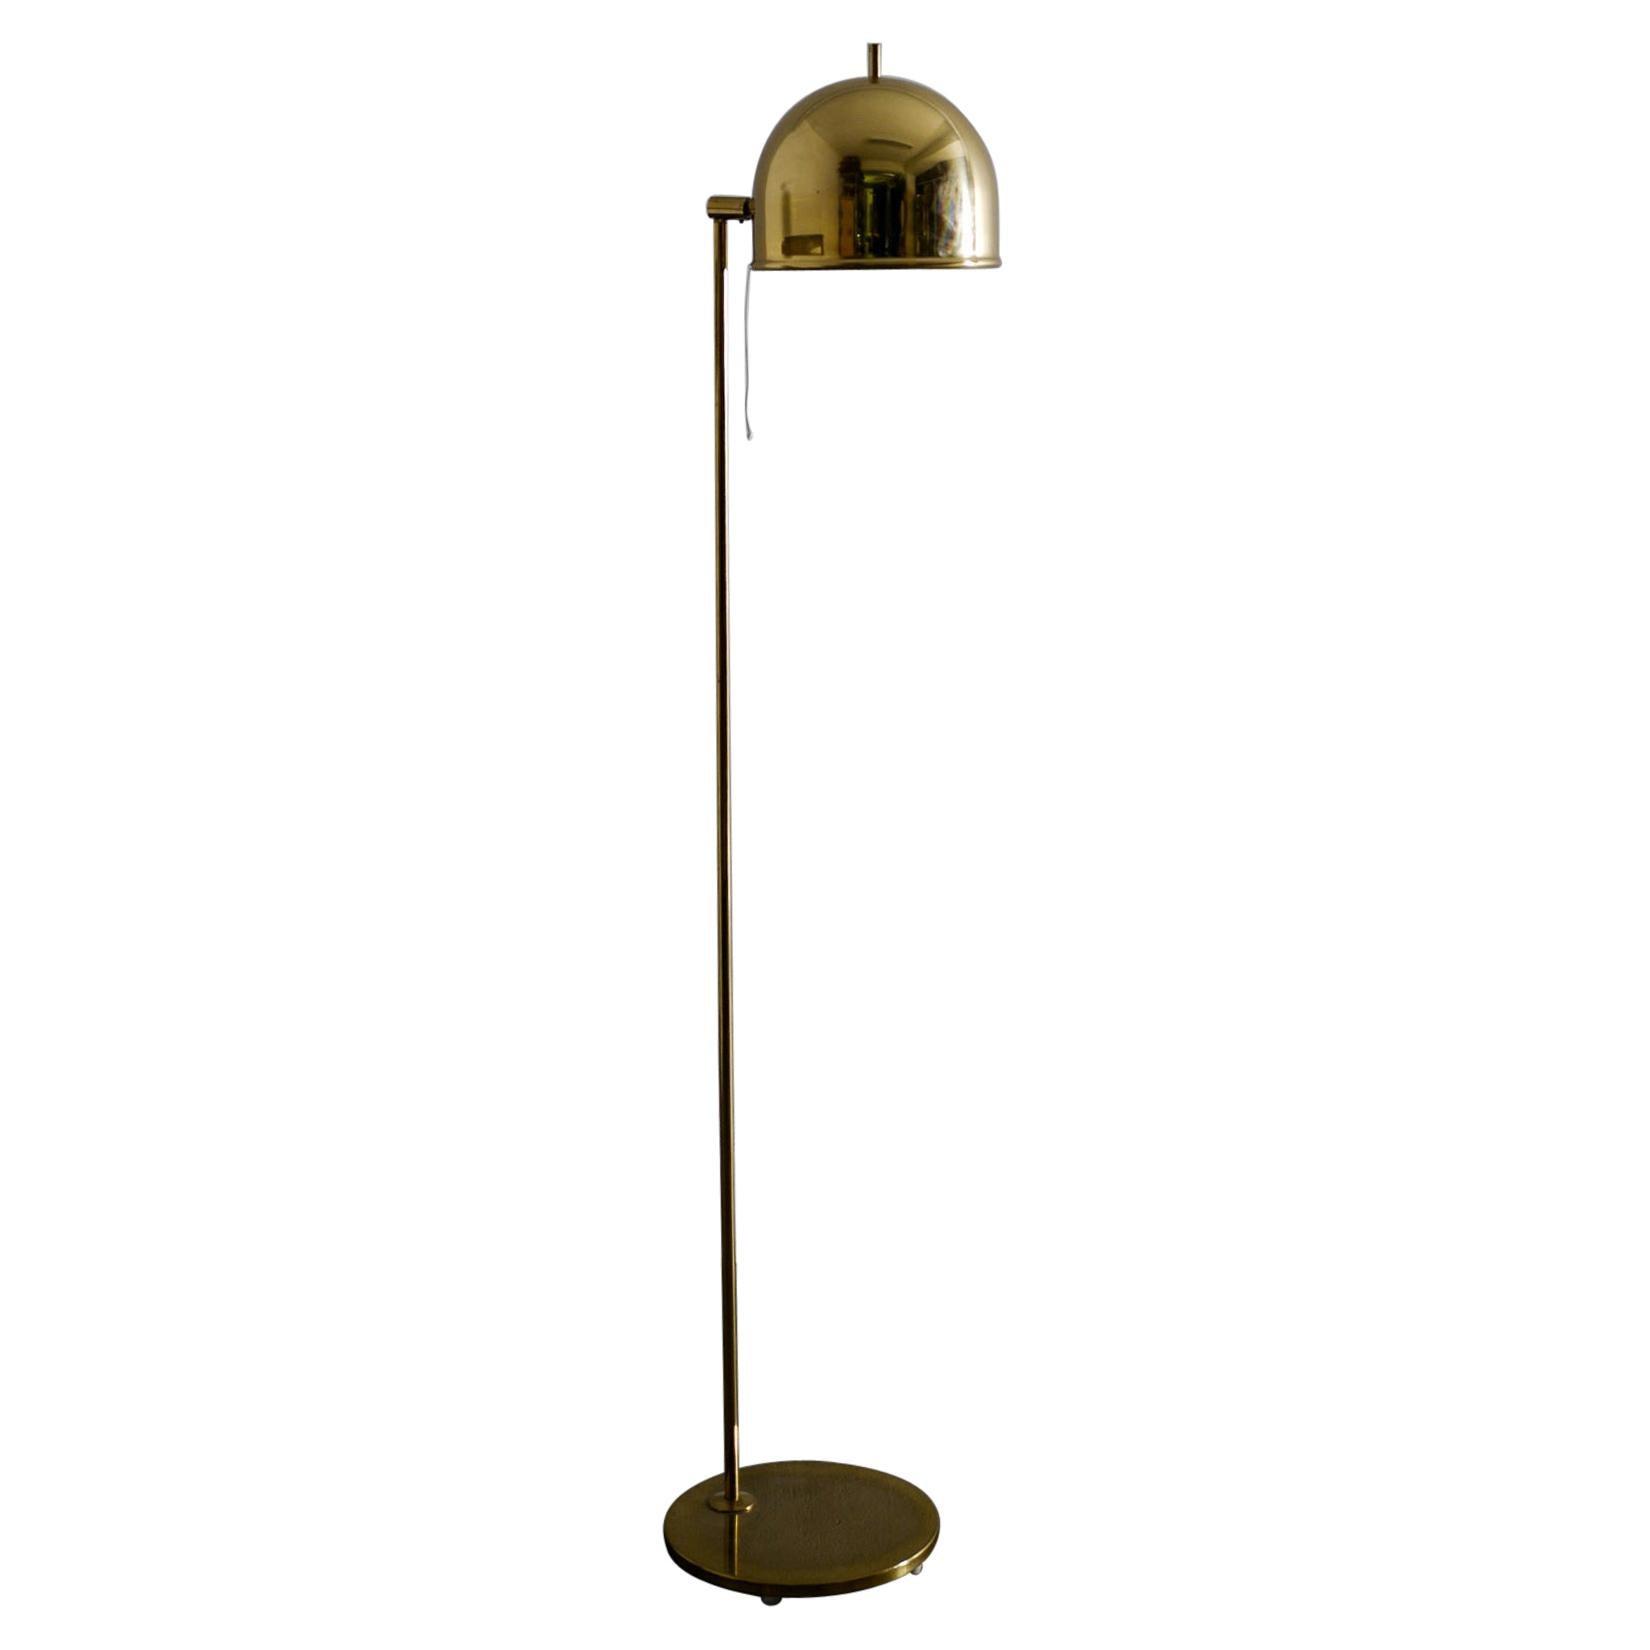 "Bergboms ""G-075"" Floor Lamp in Brass Produced in Sweden, 1960s"